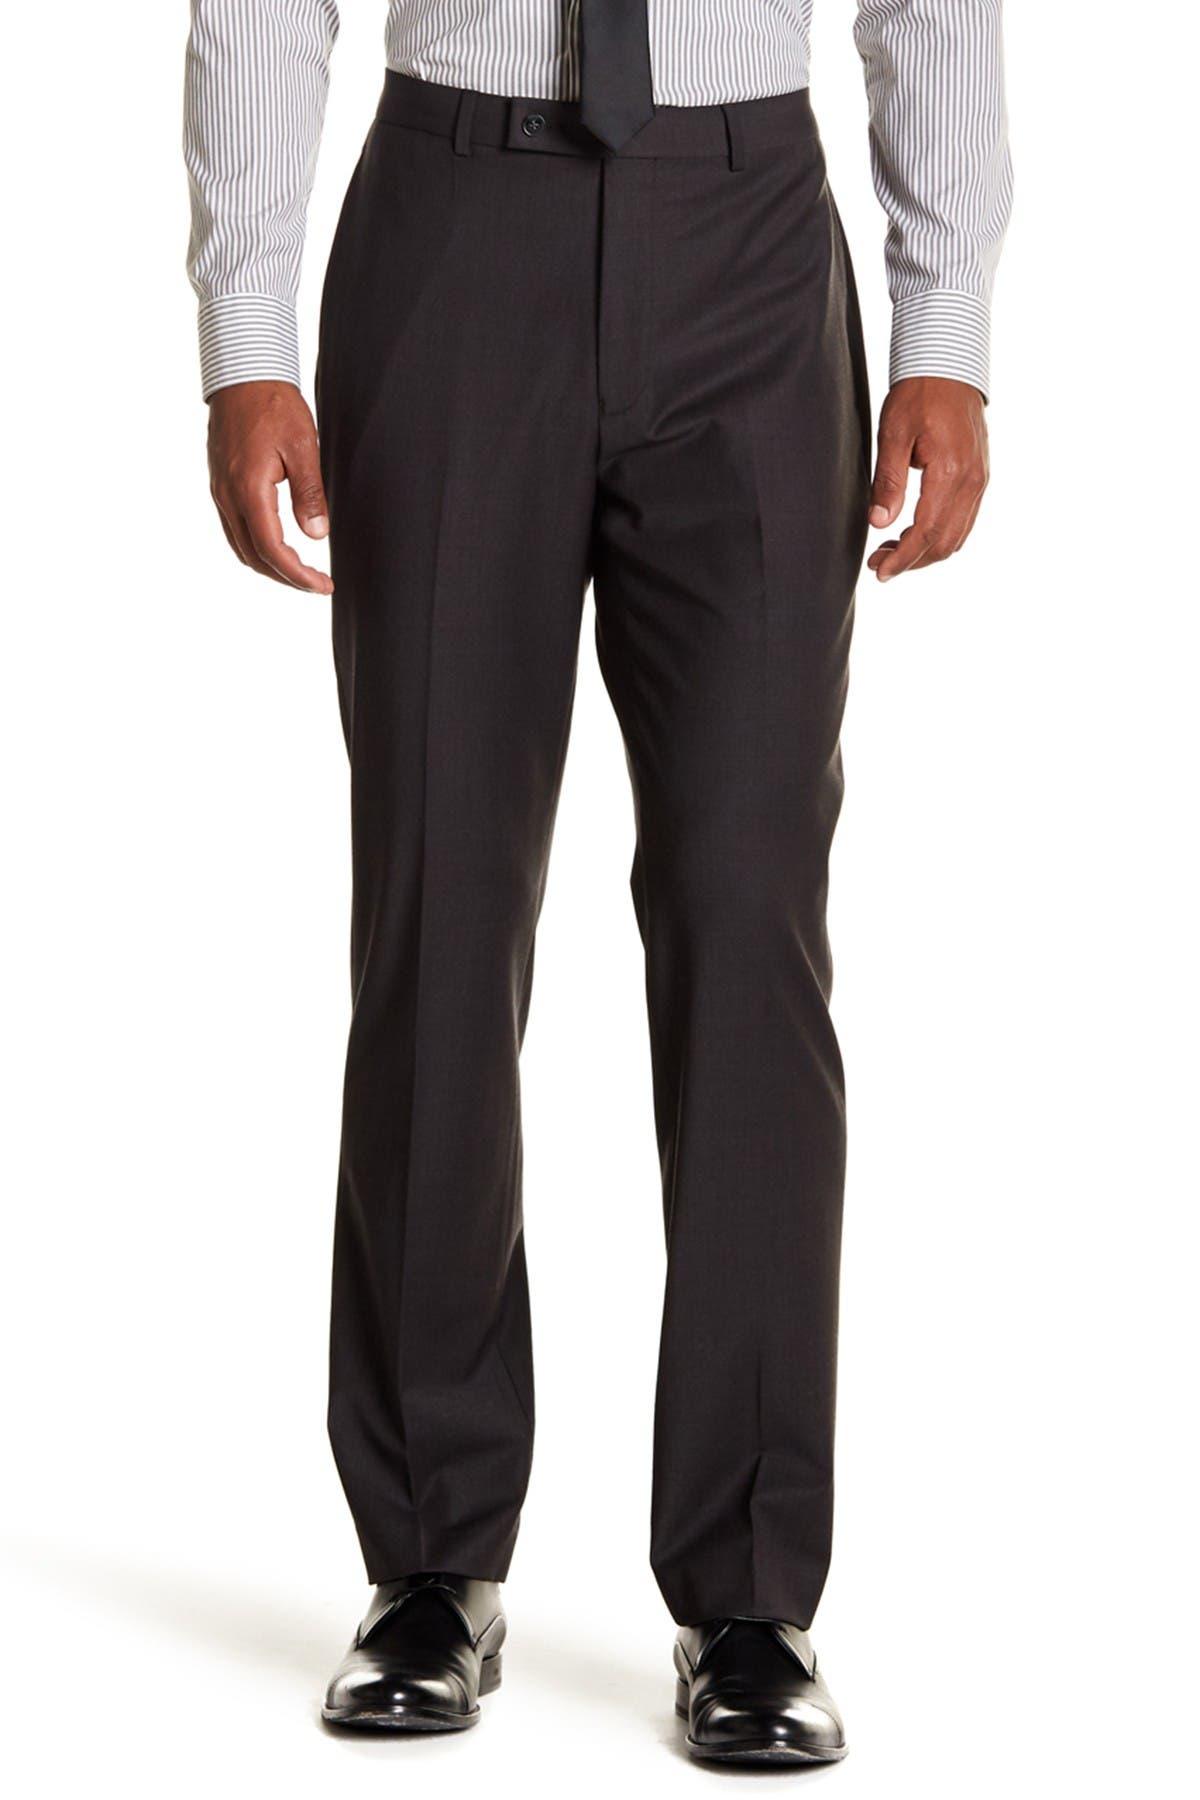 "Image of Calvin Klein Solid Gray Wool Suit Separate Pants - 30-34"" Inseam"